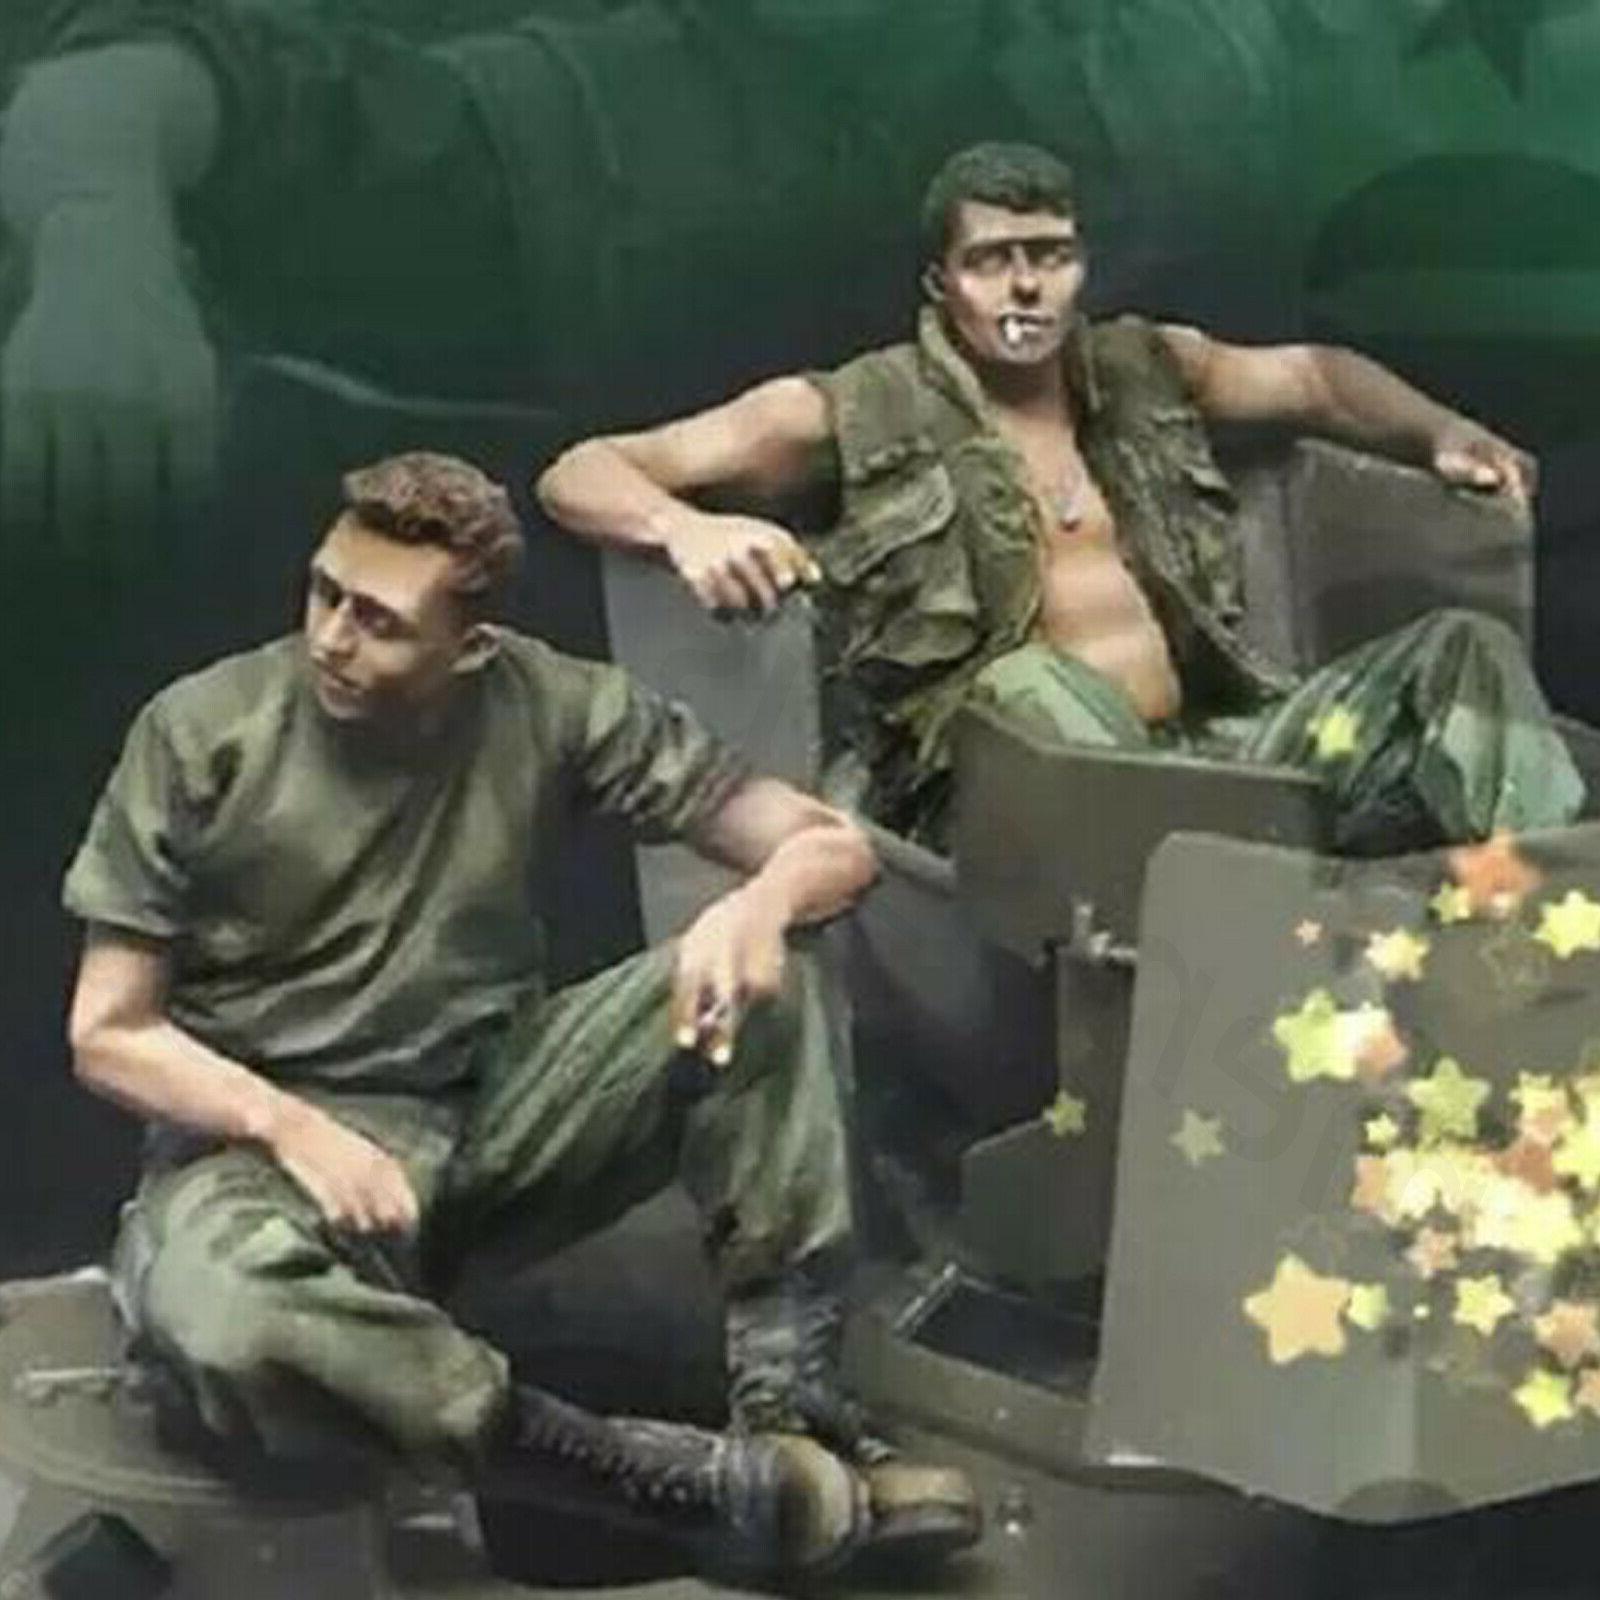 1/35 Resin Figure Model Kit US Soldiers Vietnam War Unpainte